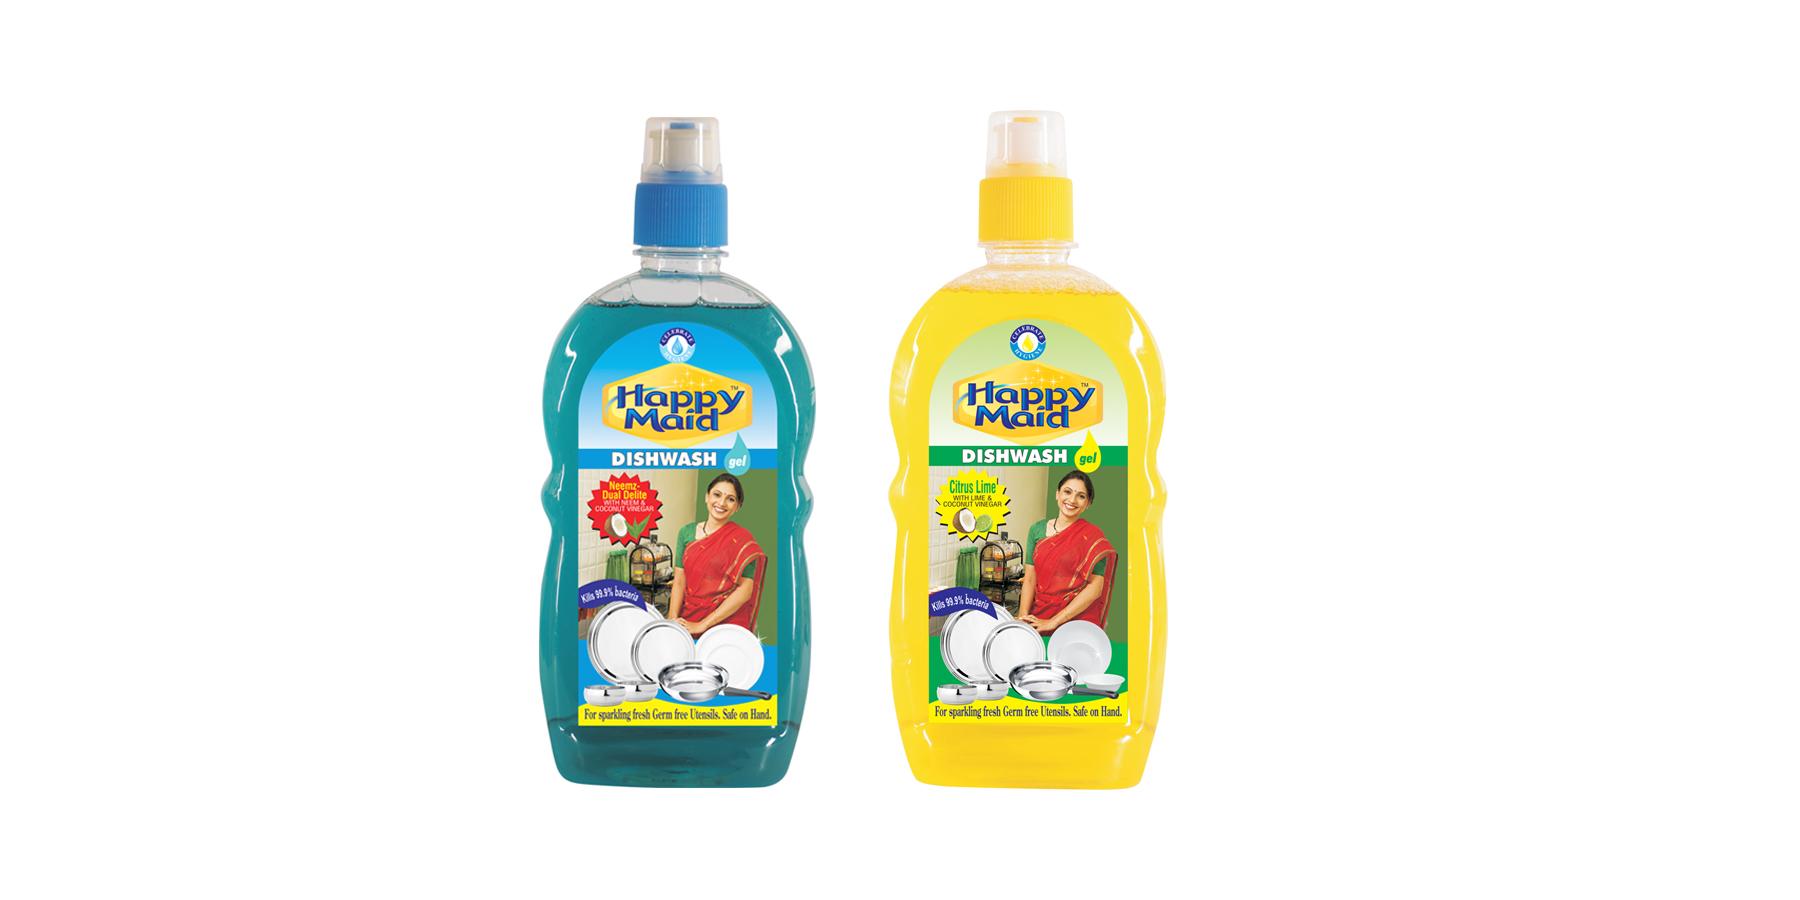 Happy Maid CITRUS LIME + NEEM Combo Dishwashing Detergent  (500 ml x 2)